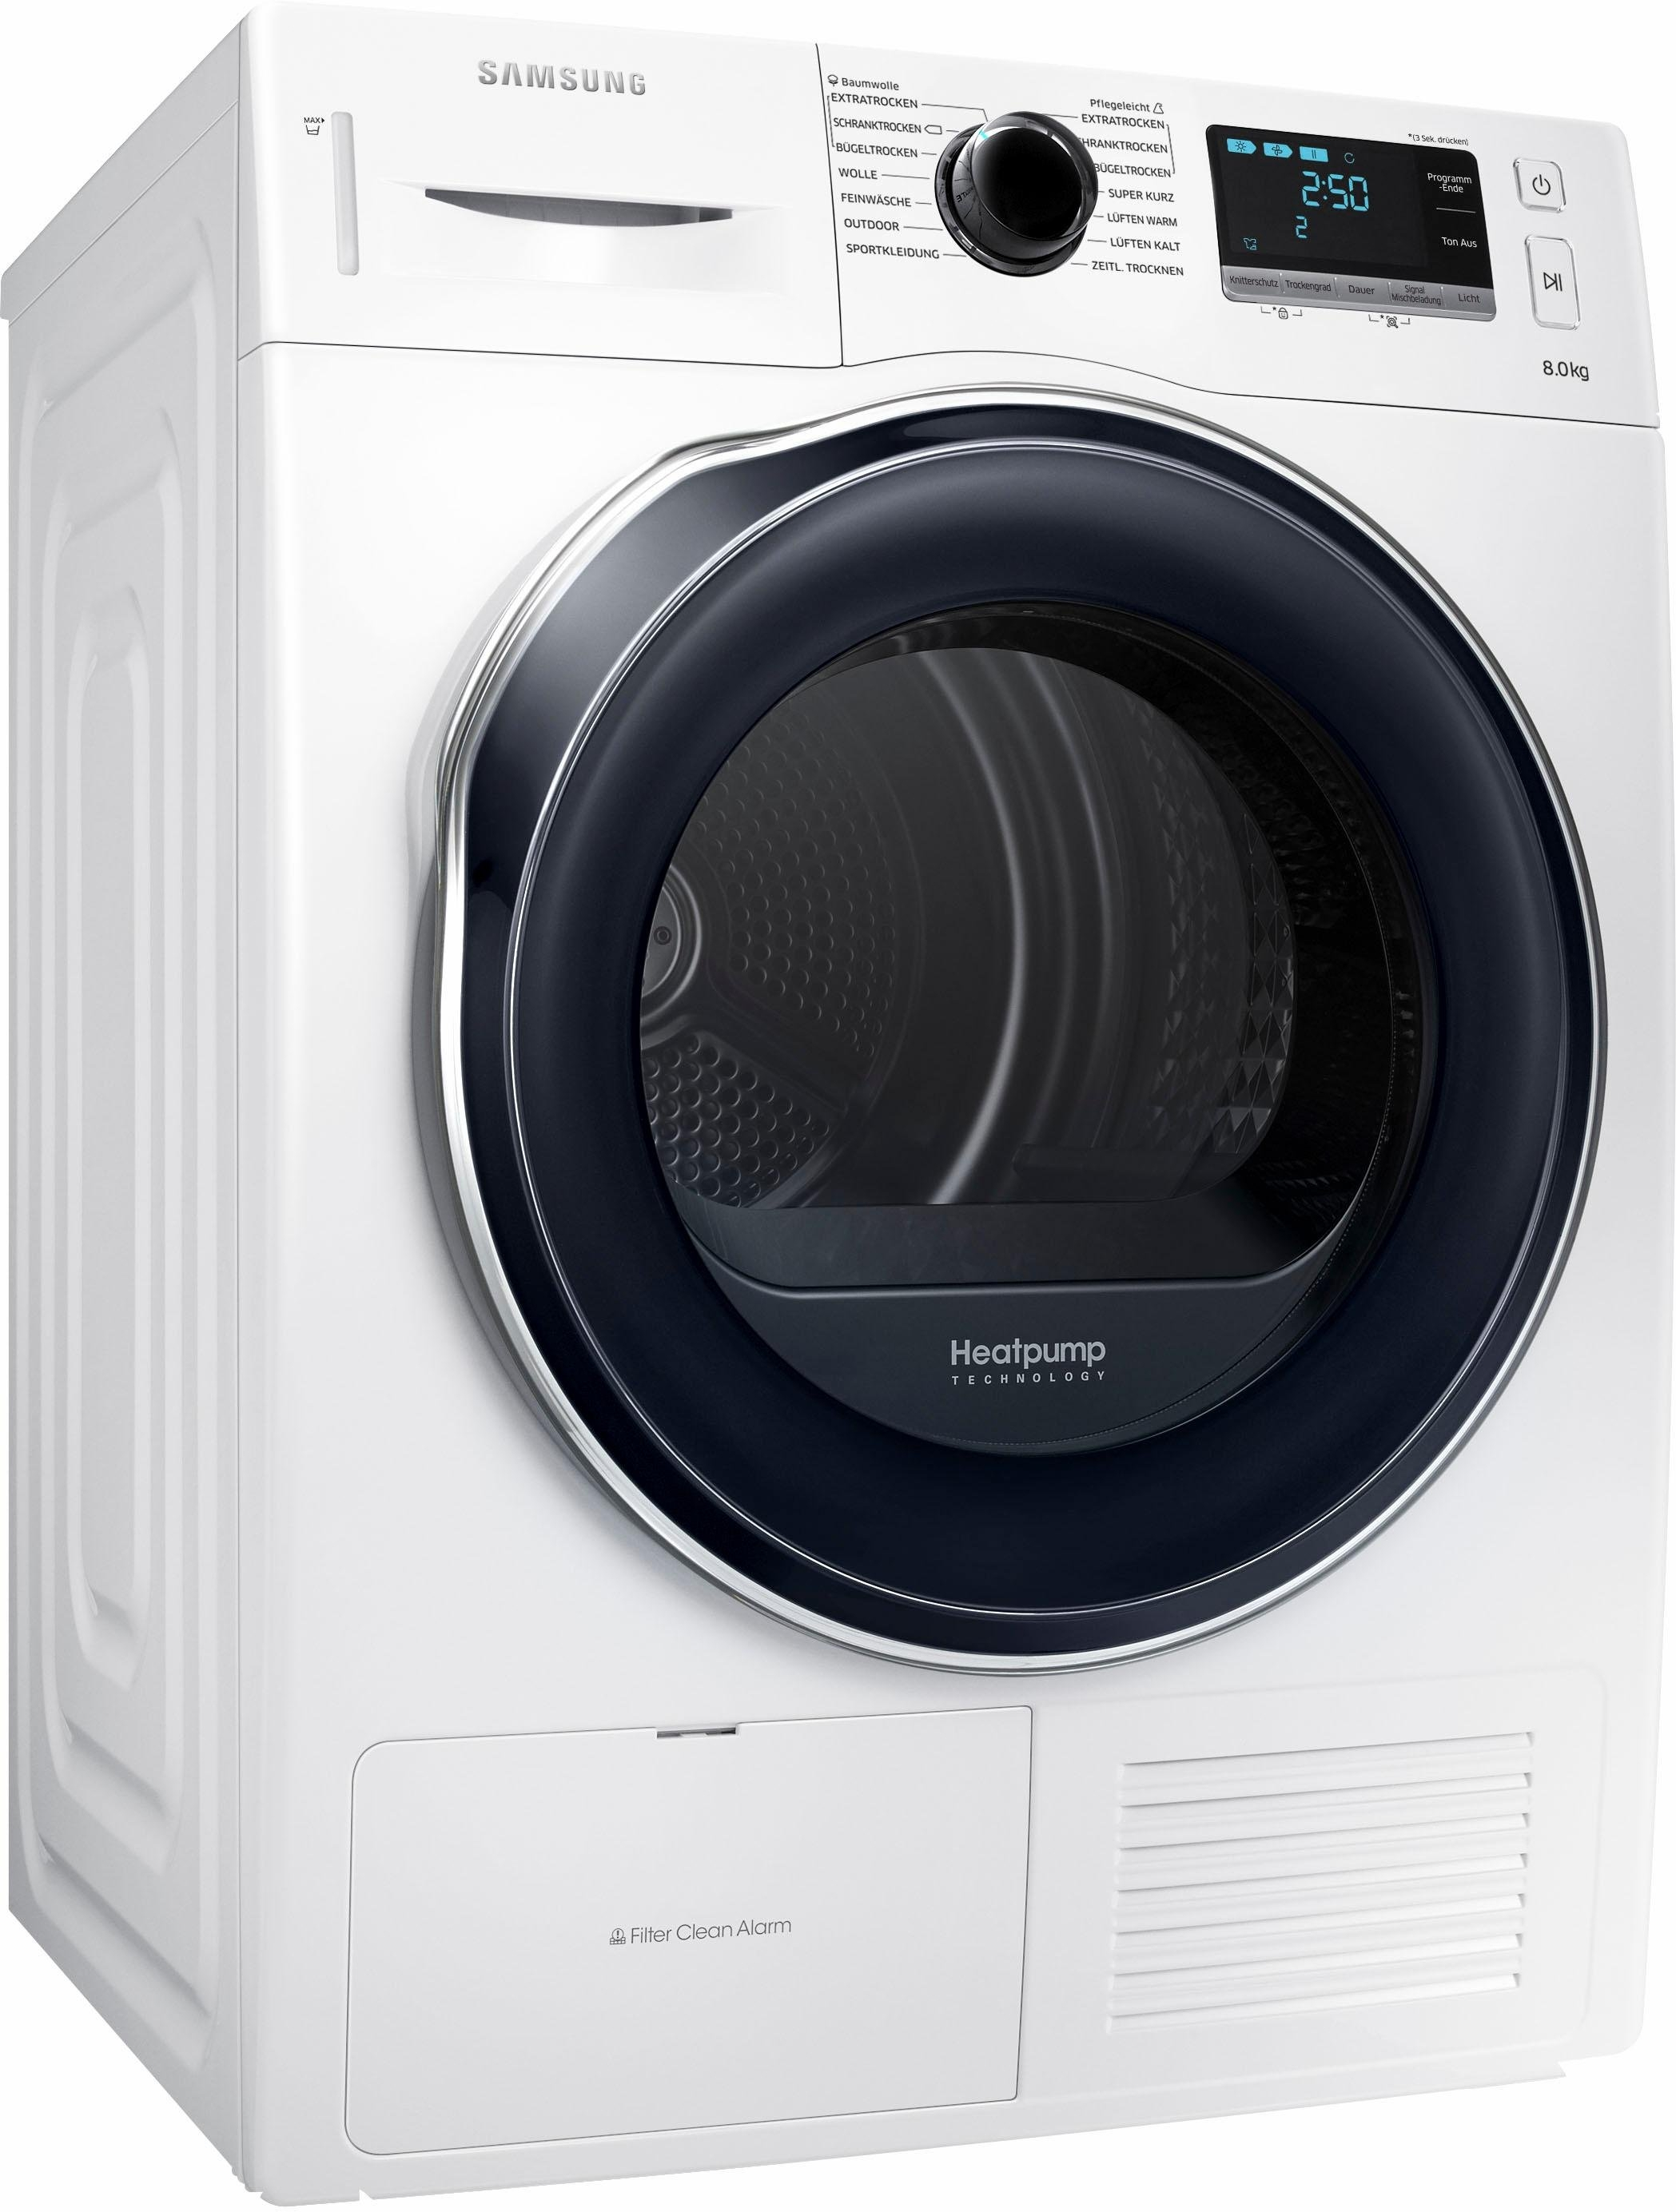 SAMSUNG warmtepompdroger DV6000 DV80K6010CW/EG voordelig en veilig online kopen